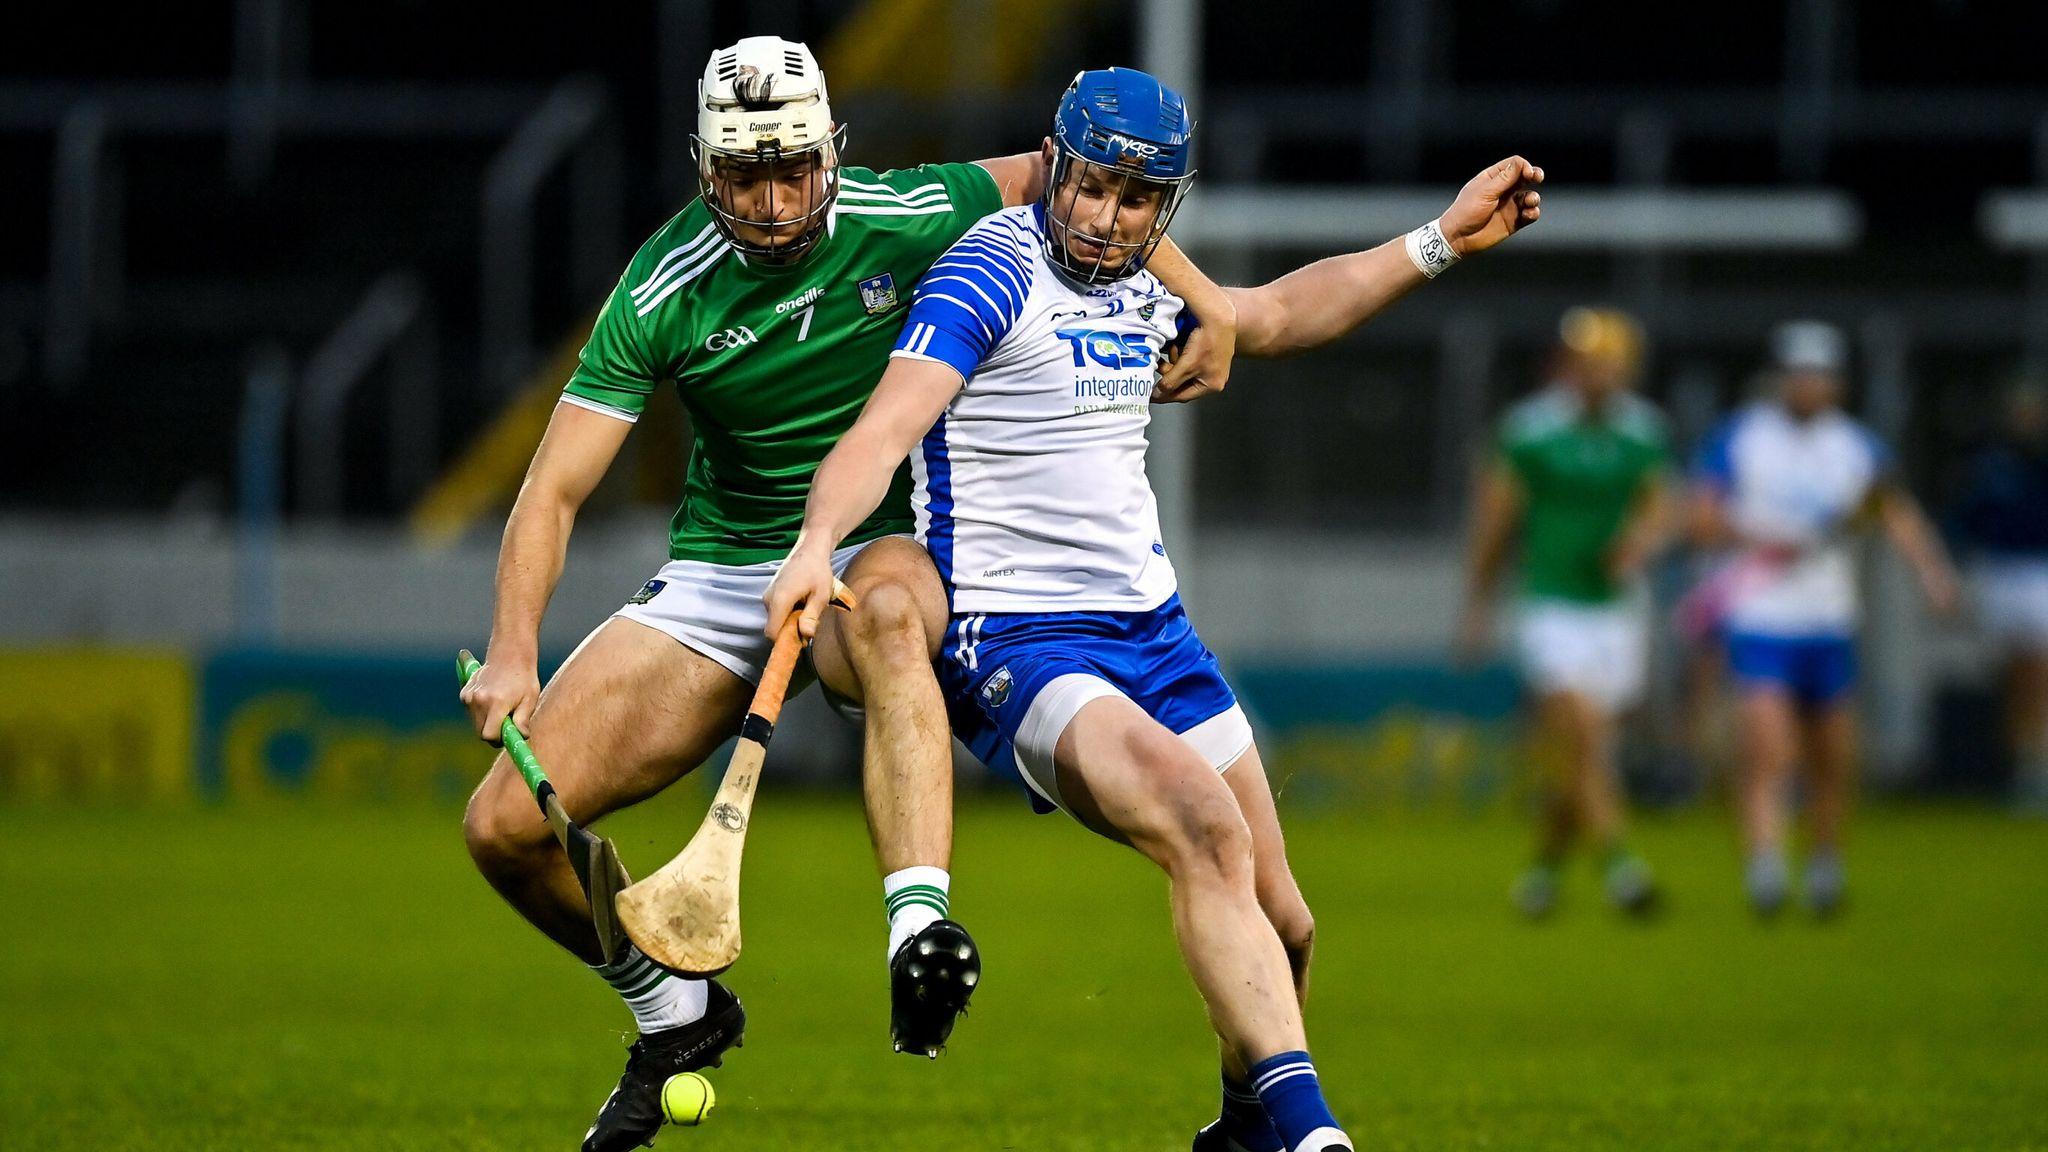 All ireland hurling final 2021 betting online sands sports betting